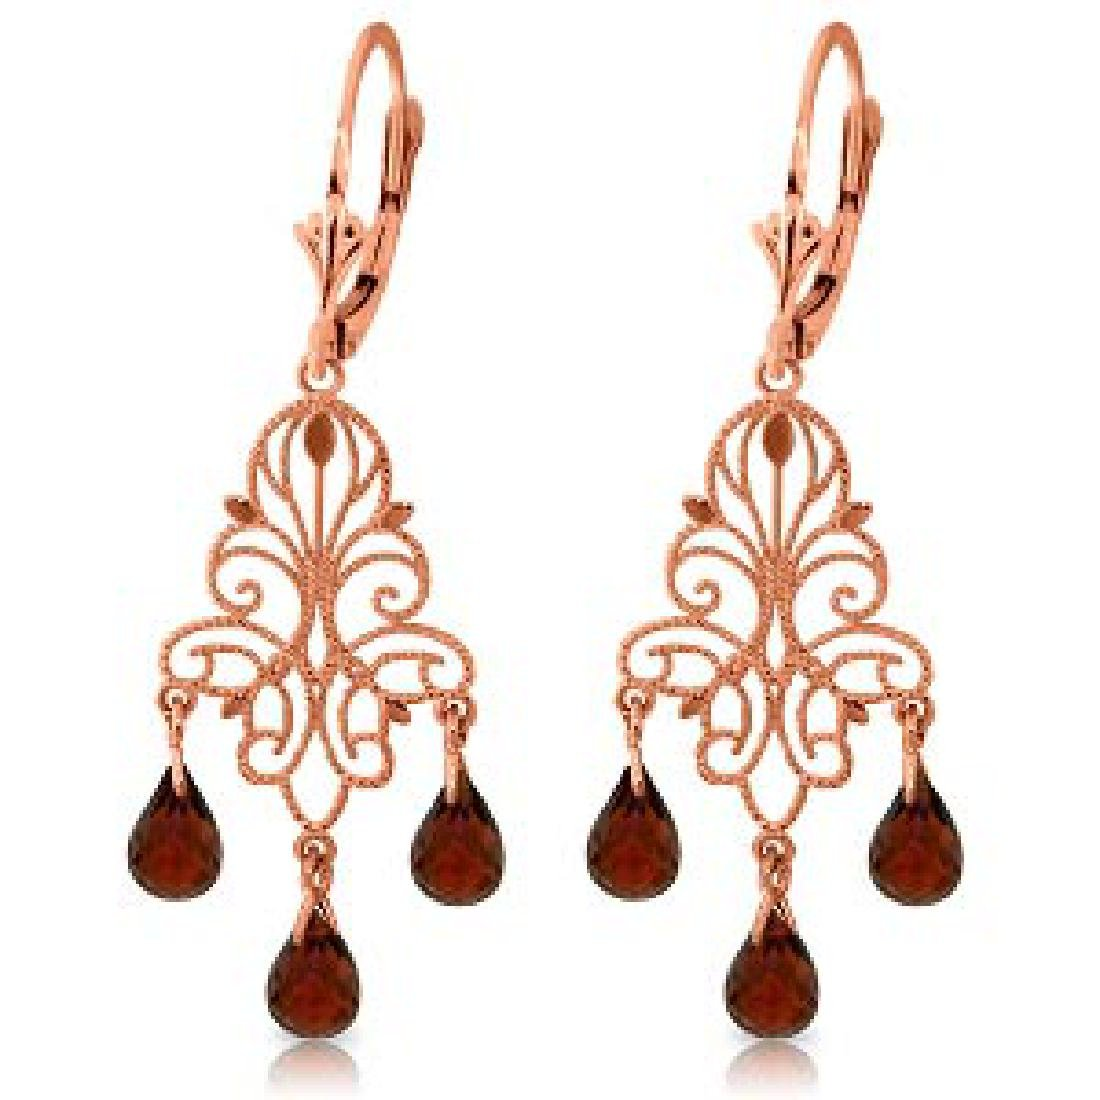 3.75 Carat 14K Solid Rose Gold Chandelier Earrings Natu